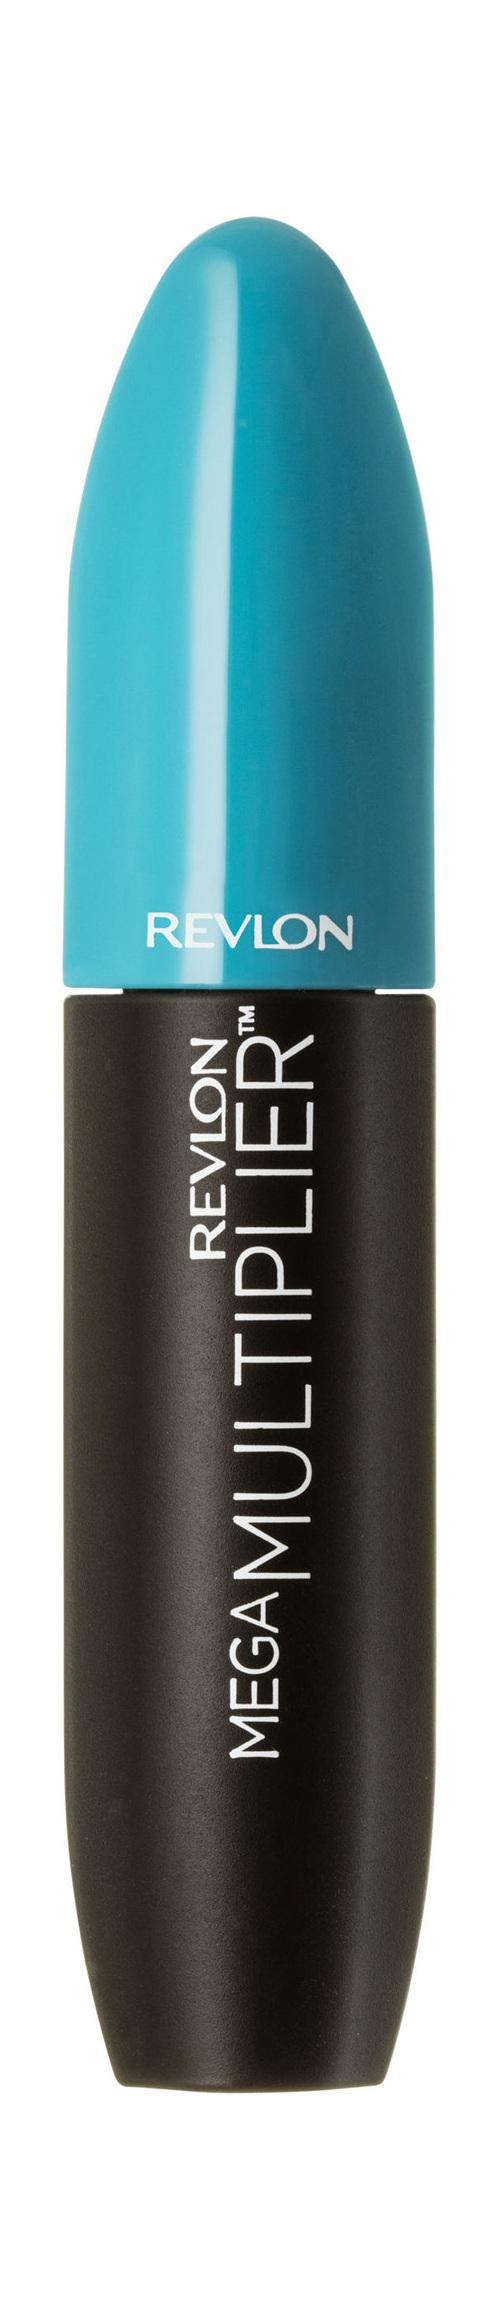 Revlon Mega Multiplier™ Mascara Blackend Brown